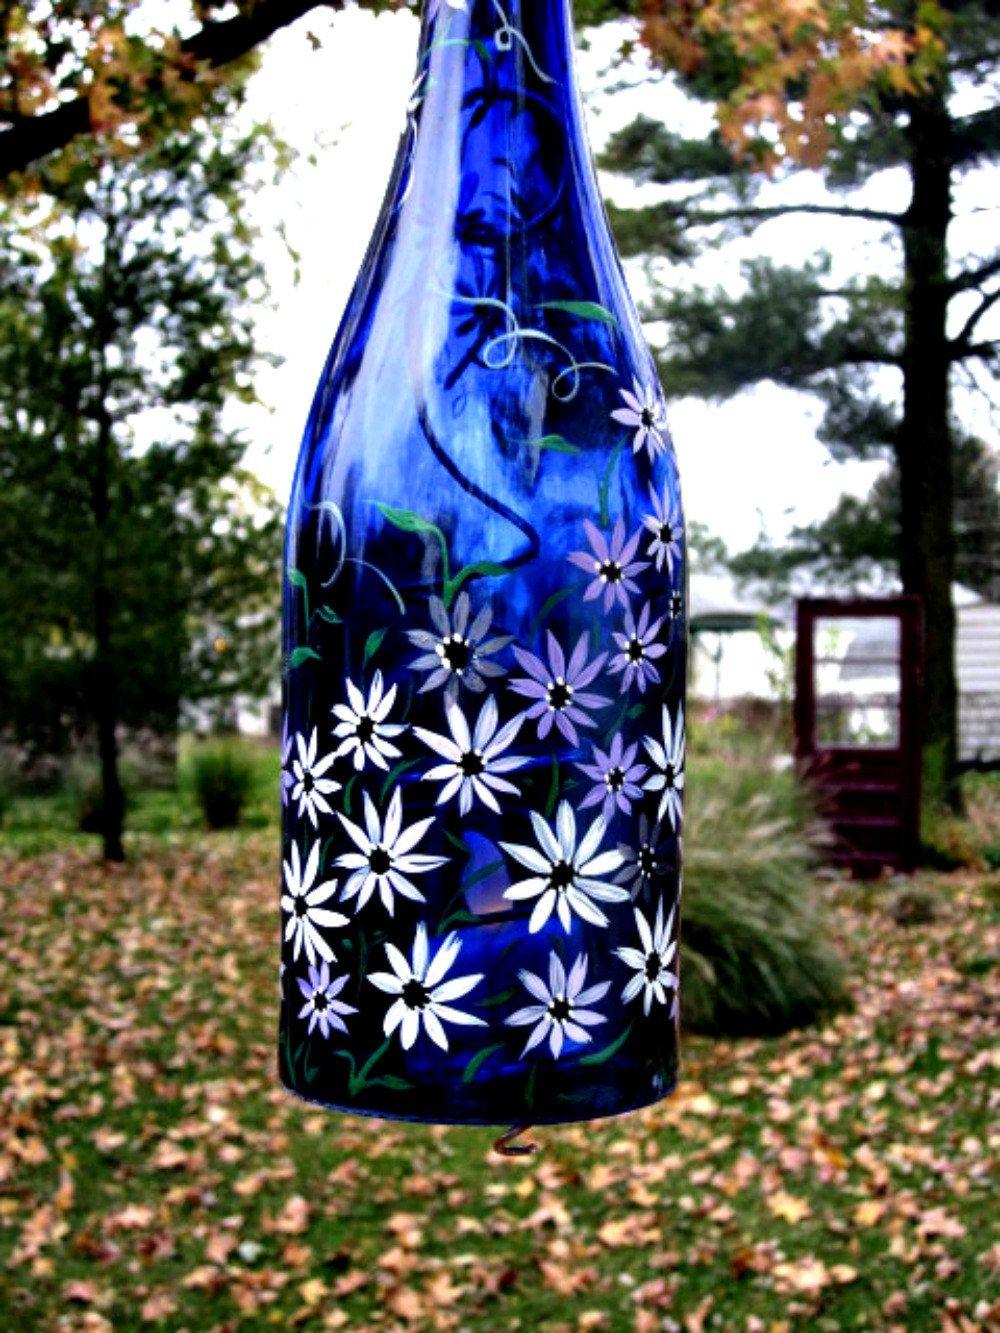 Recycled Wine Bottle Garden Light, Hanging Candle Holder